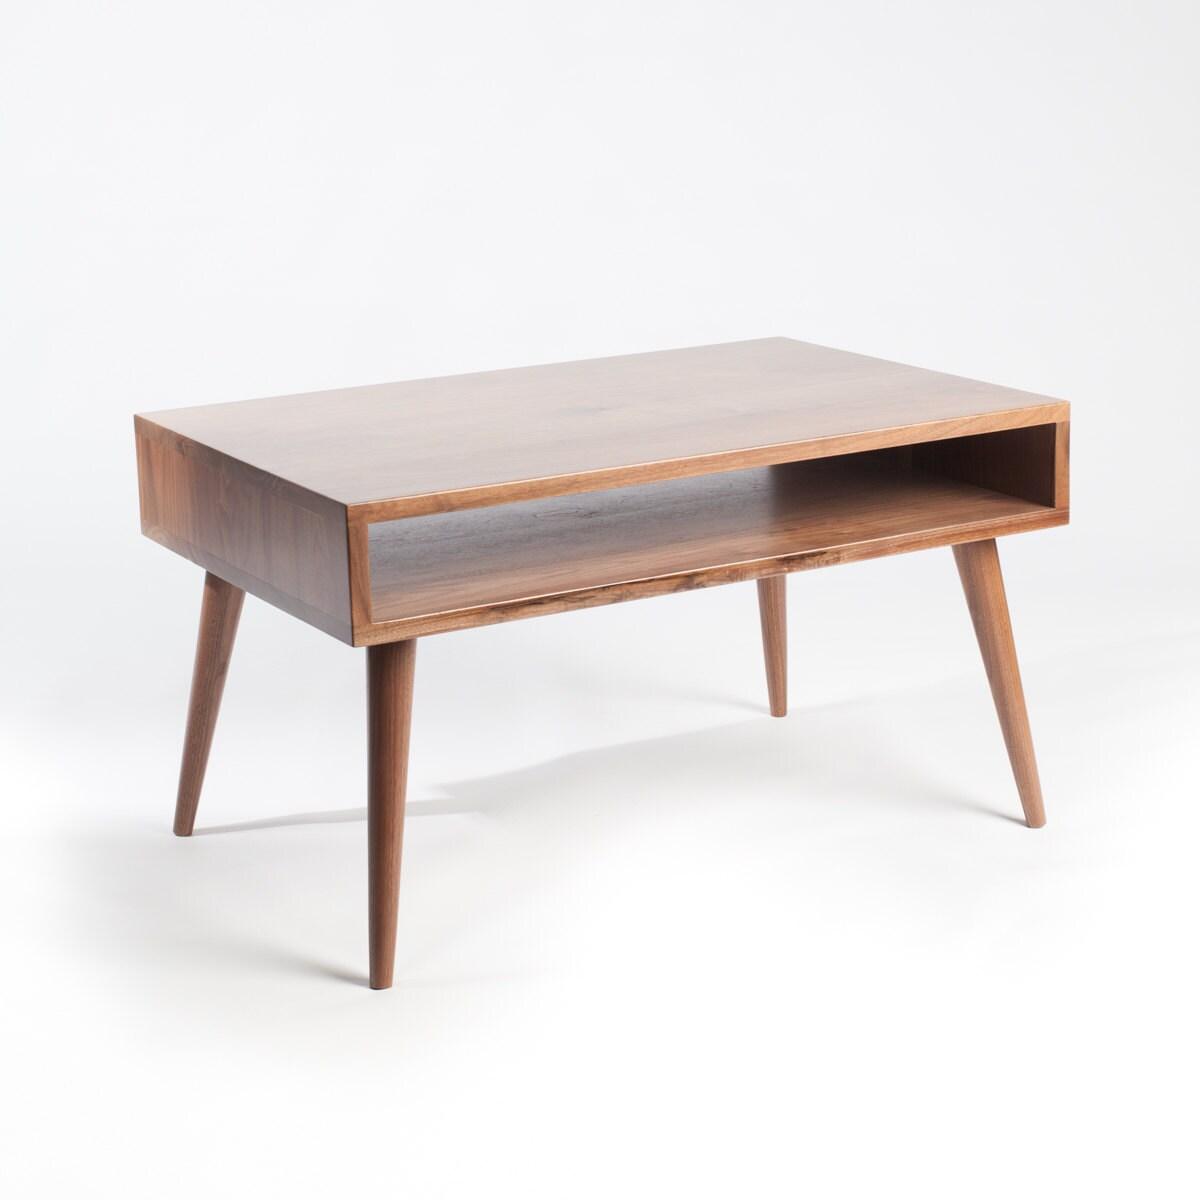 Ikea Mid Century Modern Coffee Table: Mid Century Modern Replacement IKEA Furniture Legs. Premium